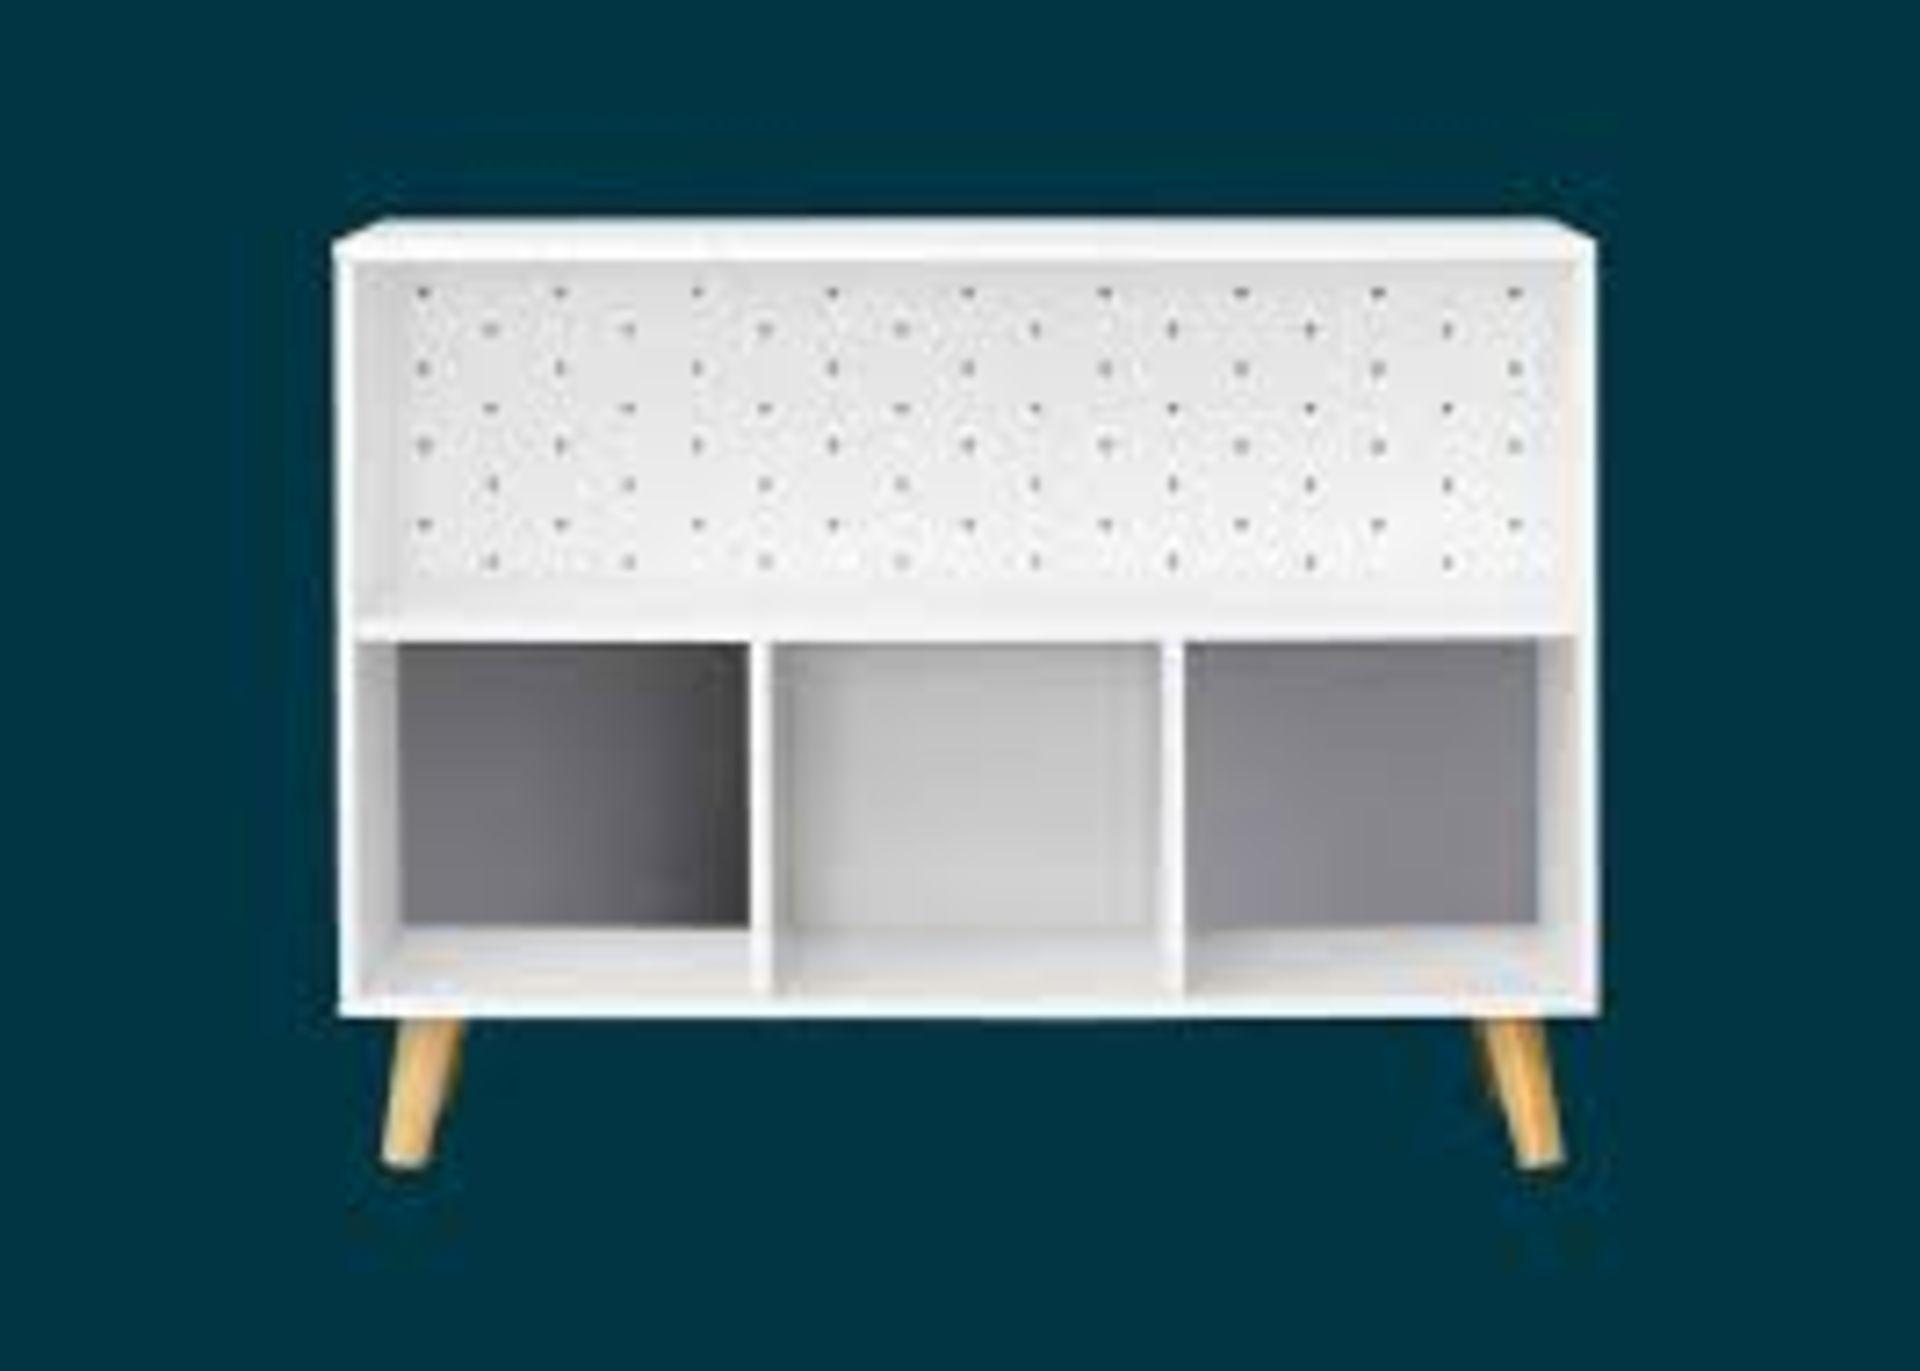 (P3) 1x Flexi Storage Kids Cube Unit With Legs White / Grey. (H580x W780x D280mm)